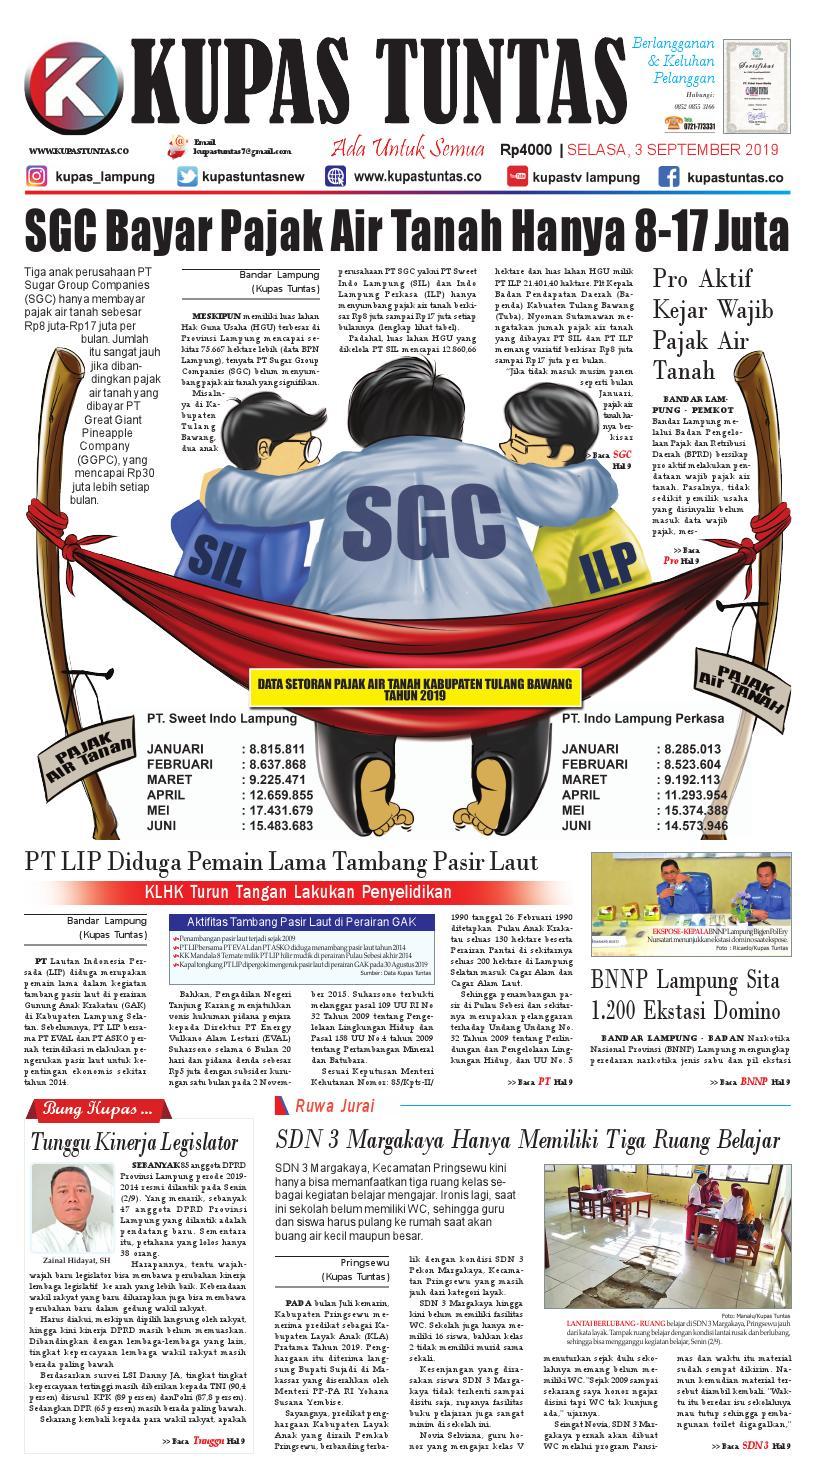 Surat Kabar Harian Kupas Tuntas Edisi Selasa 03 September